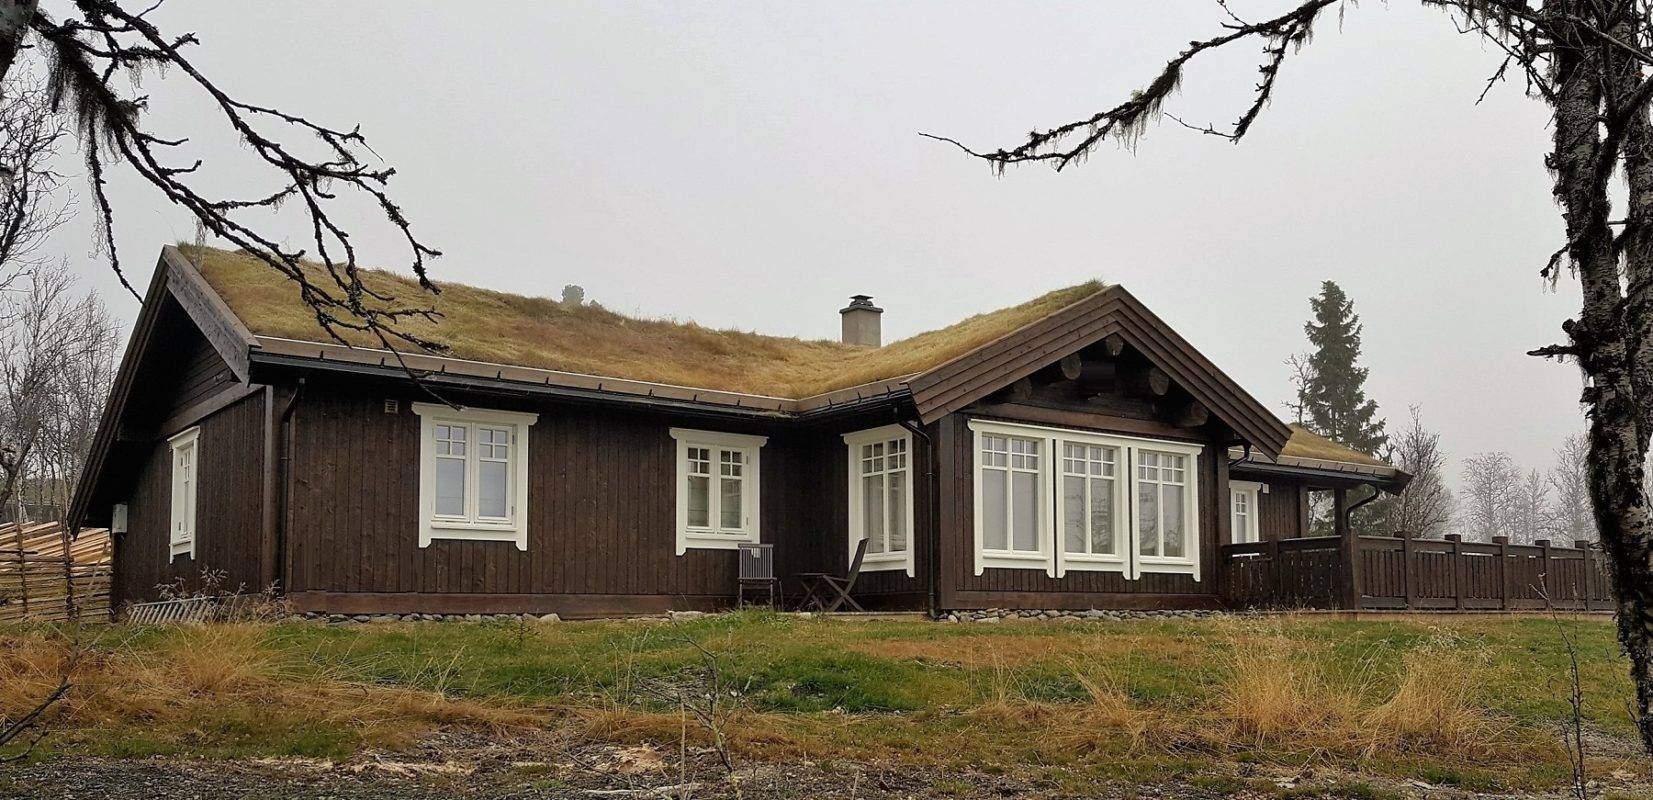 61 Vaset Snøtind113 167 61